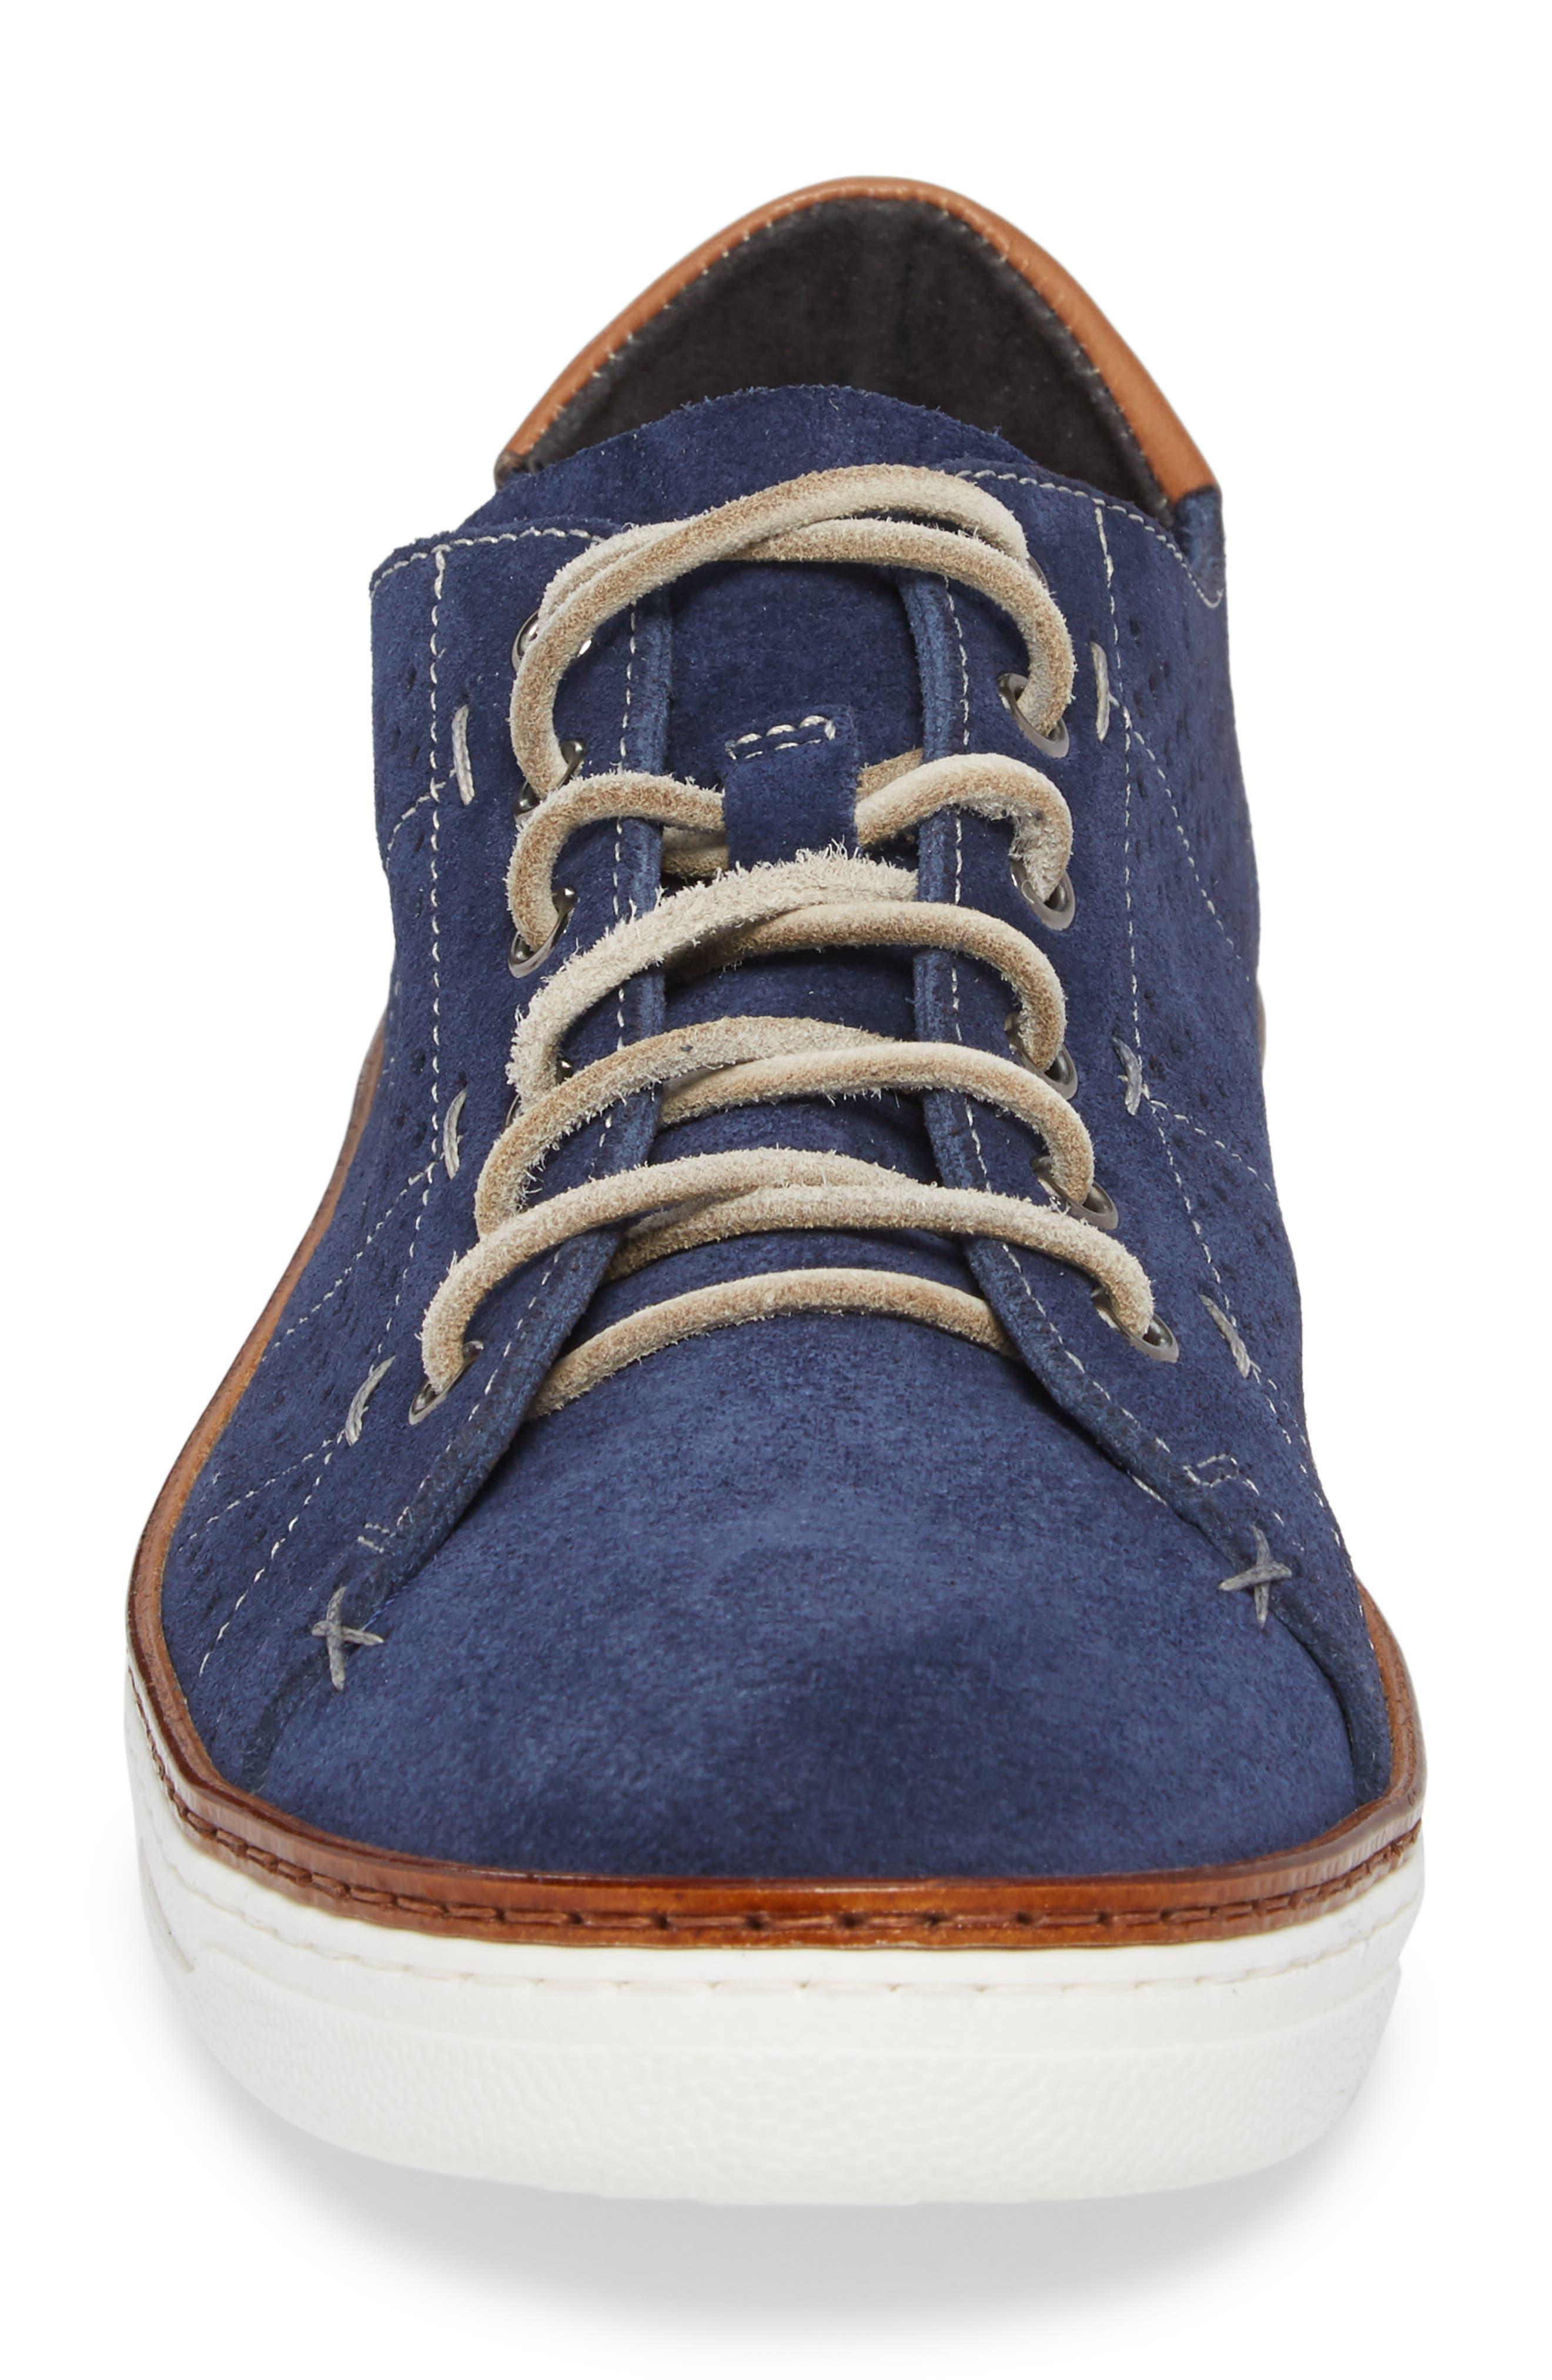 Jace Weatherproof Sneaker,                             Alternate thumbnail 4, color,                             JEANS